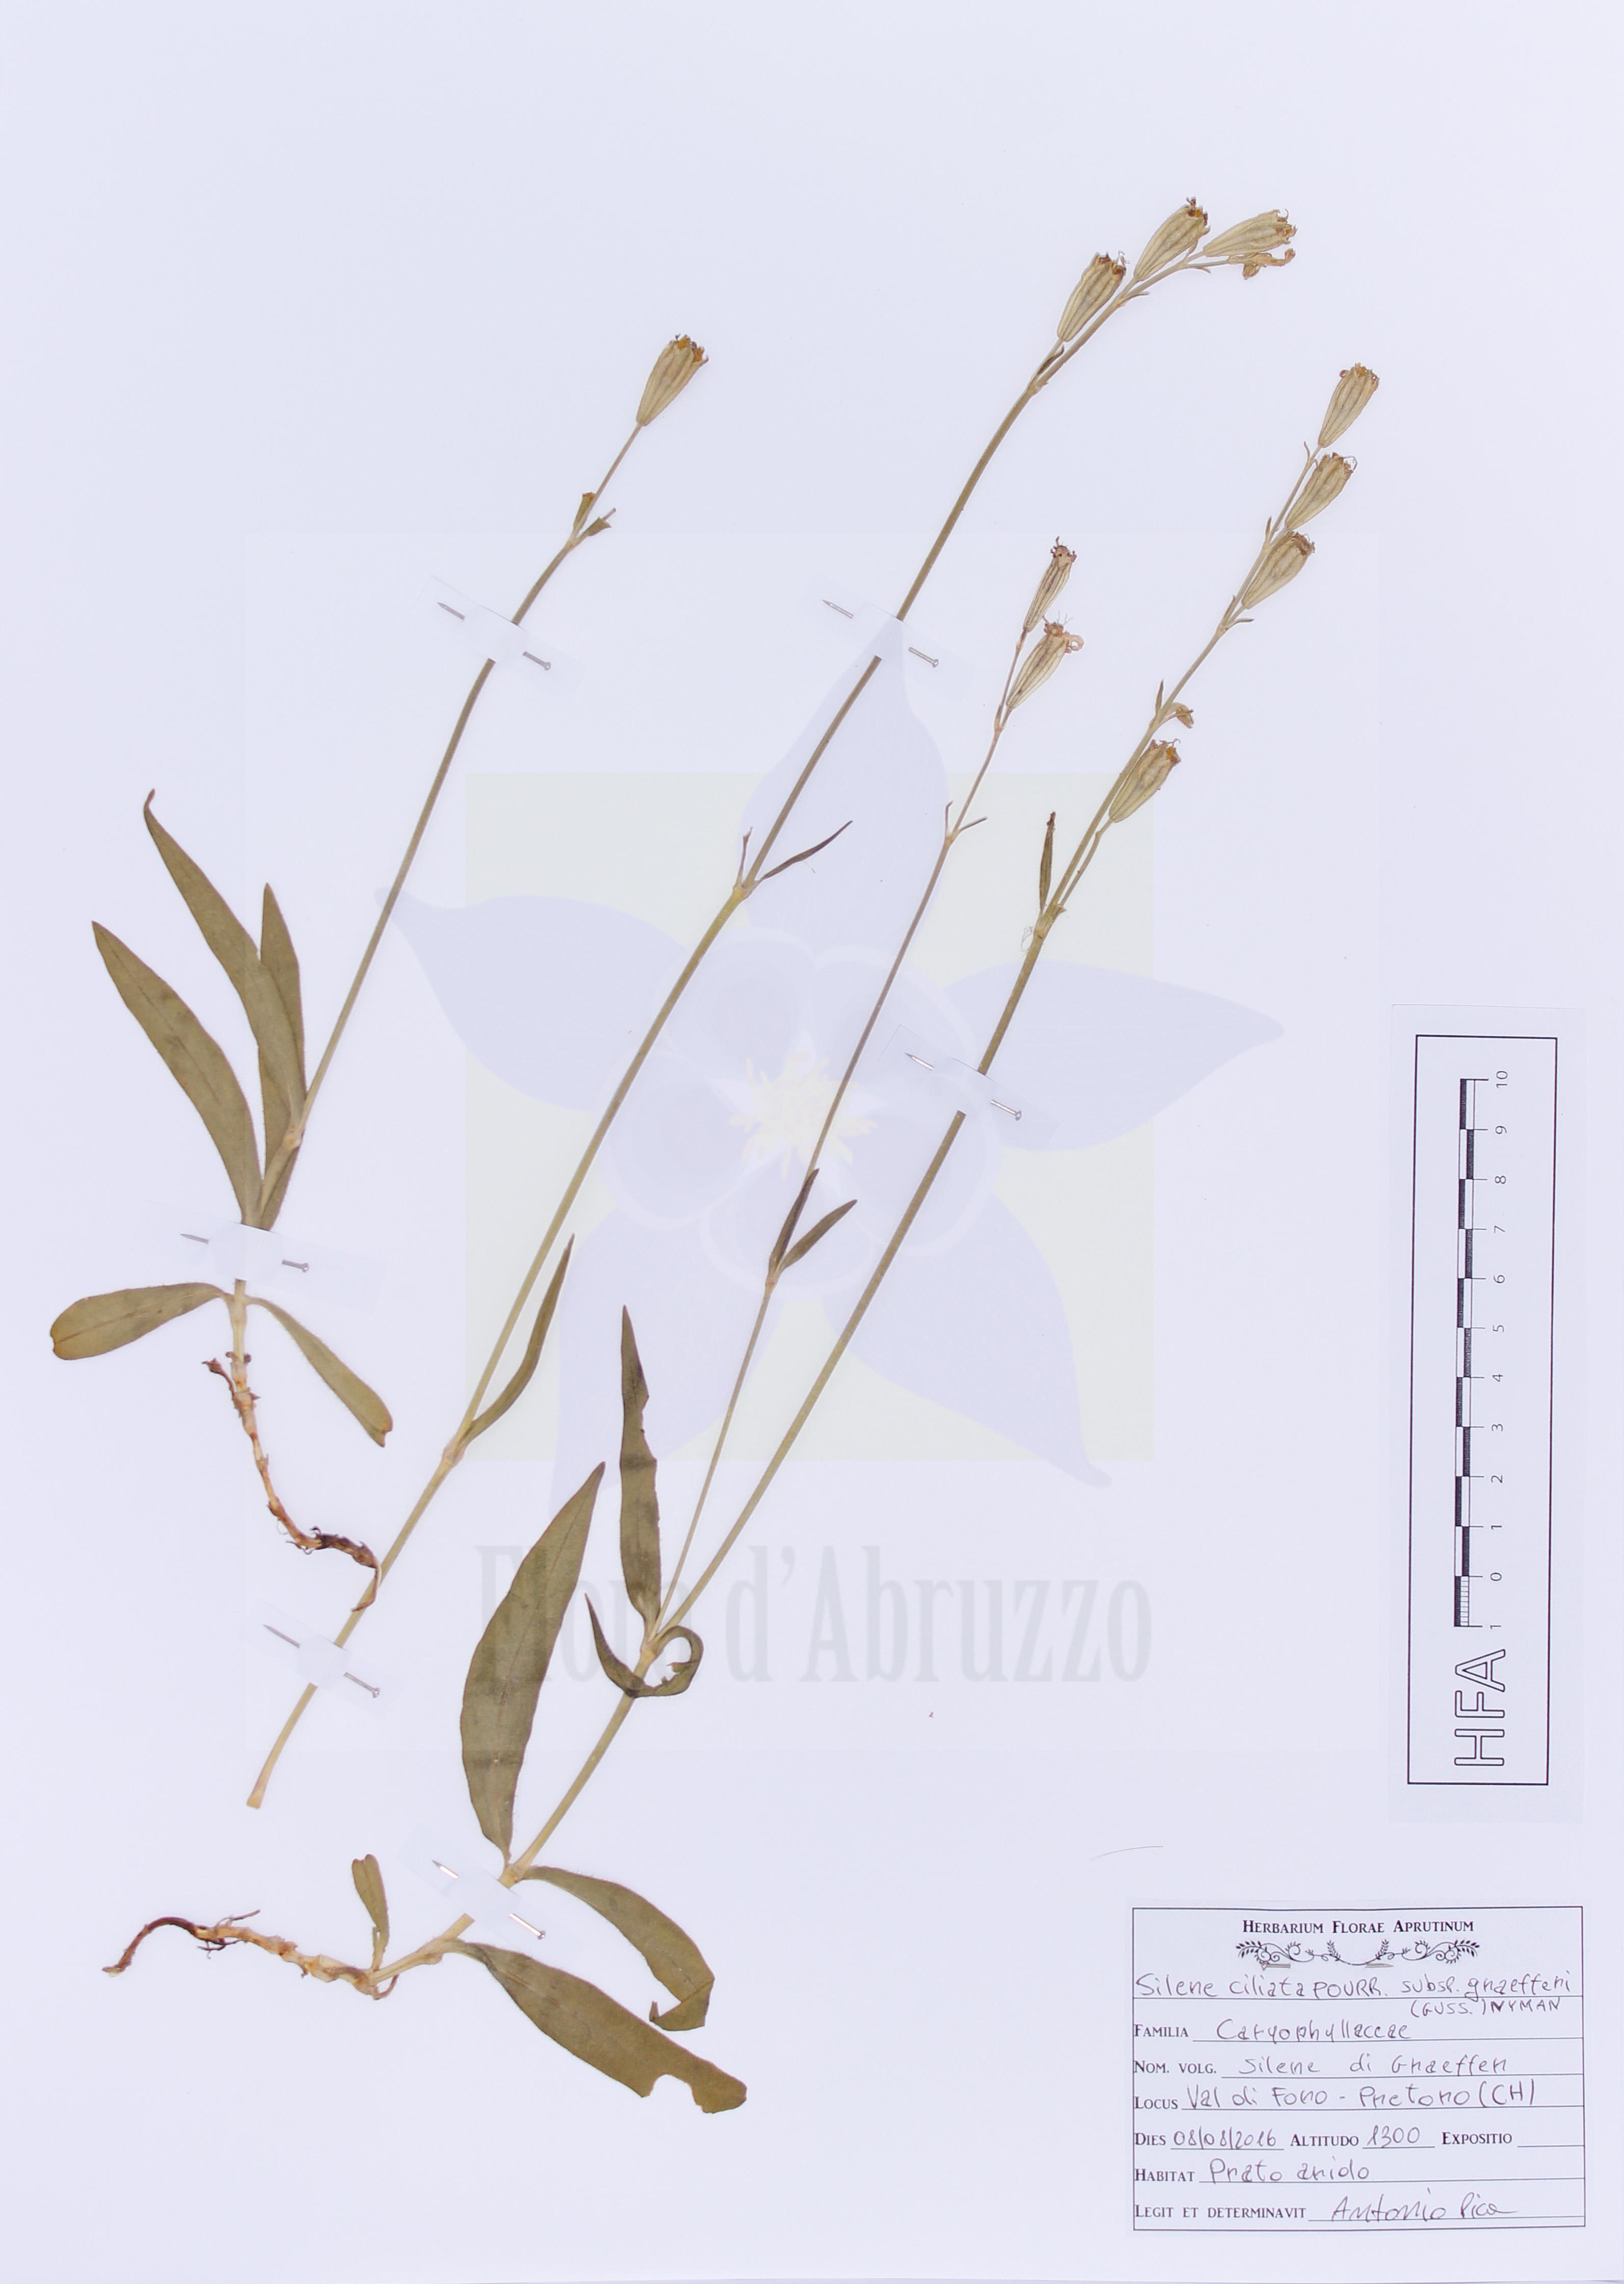 Silene ciliata Pourr. subsp. graefferi (Guss.) Nyman